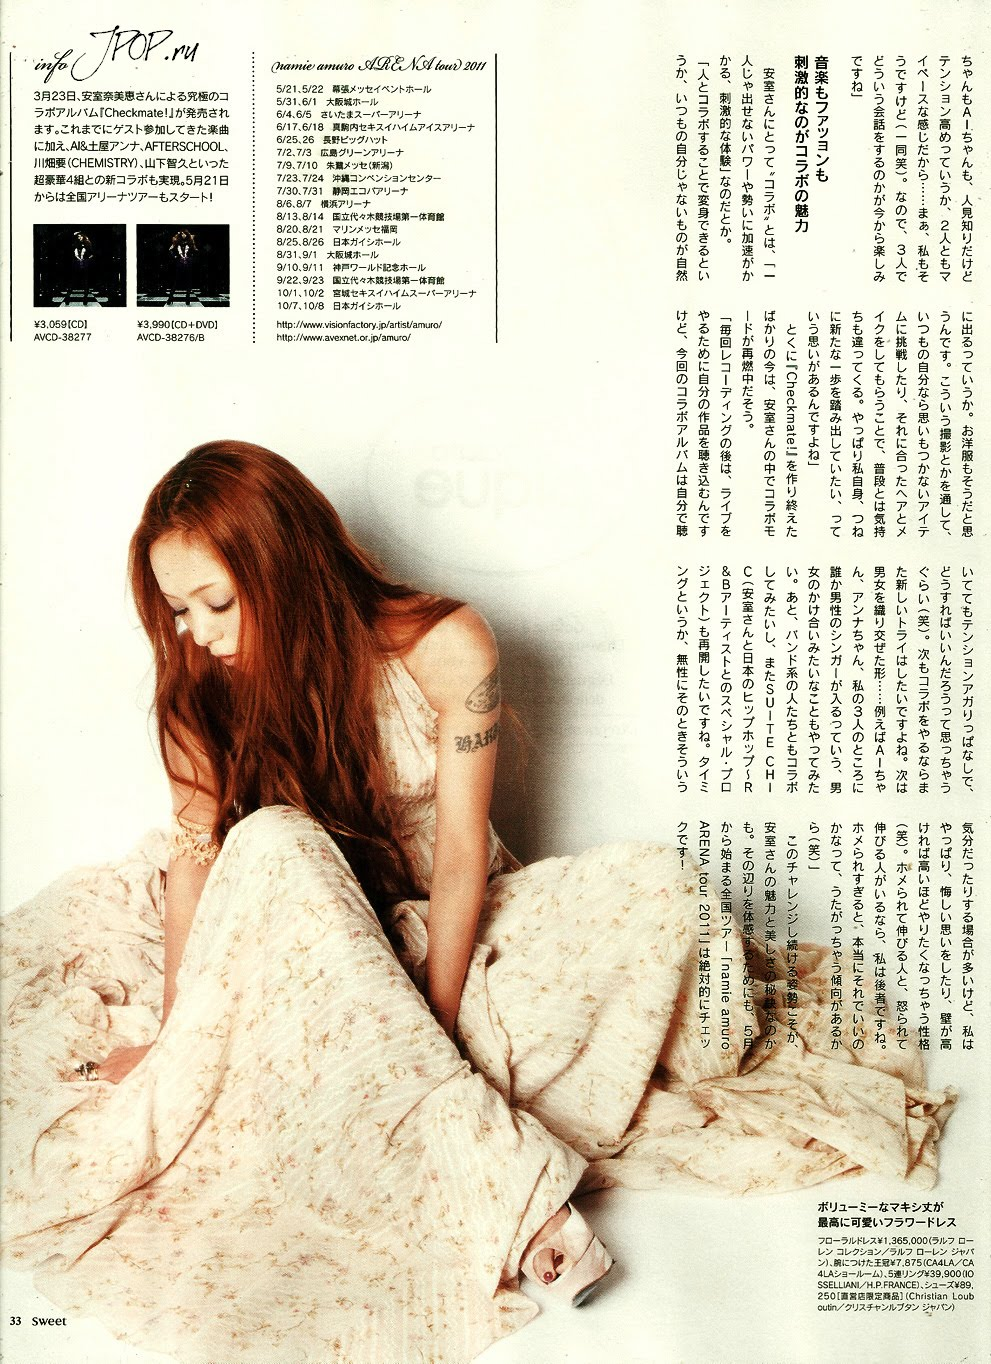 Amuro Namie 18061823212114 (JPOP.ru).jpg